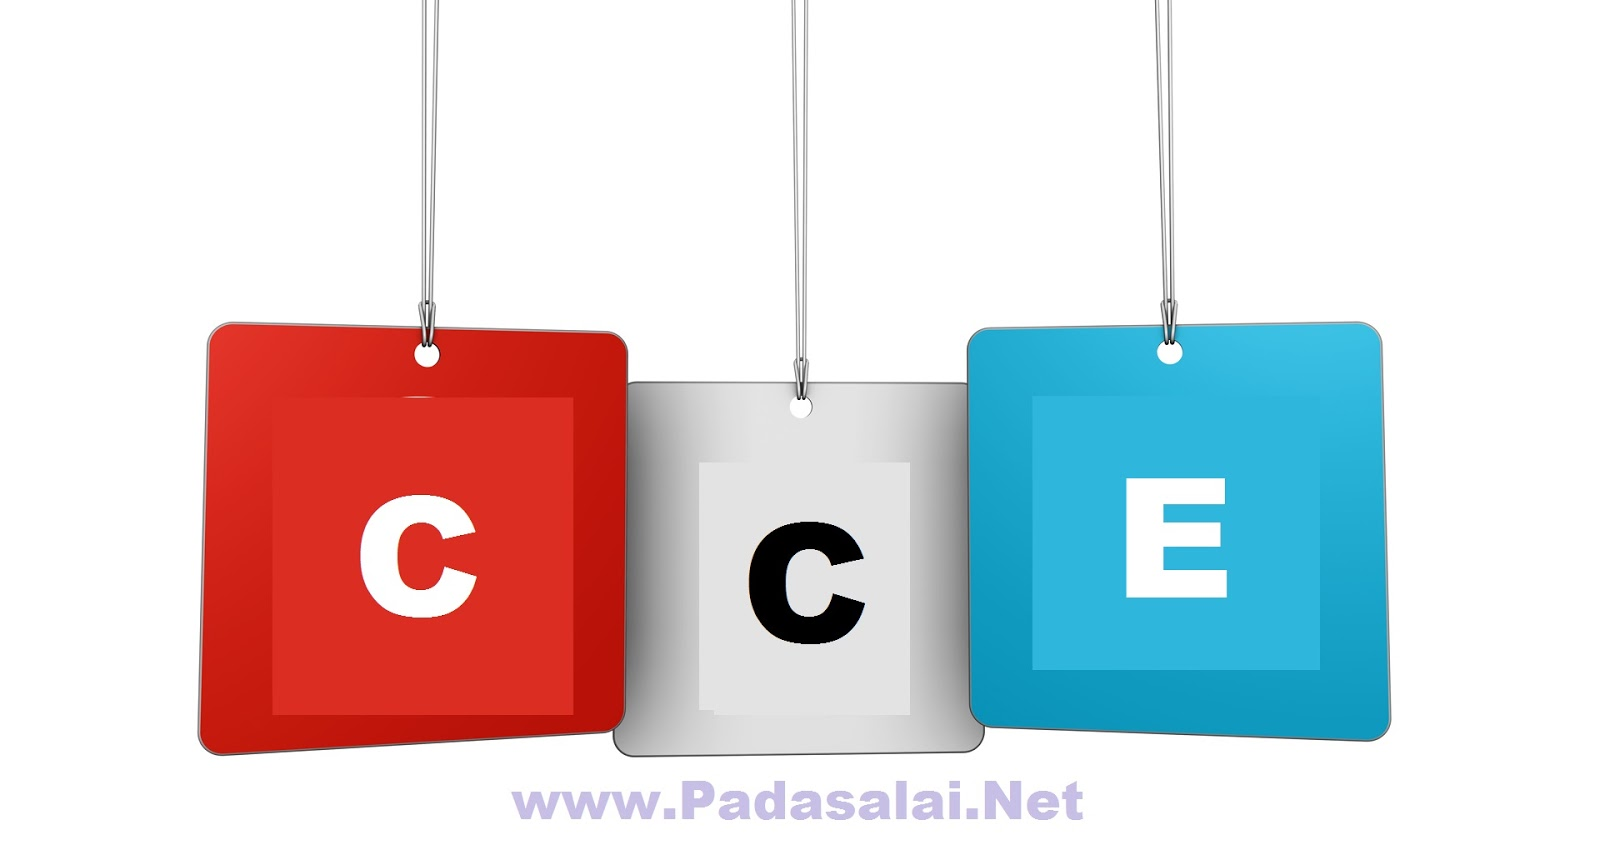 Cce Worksheet 3 Questions Amp Answer Keys Padasalai No 1